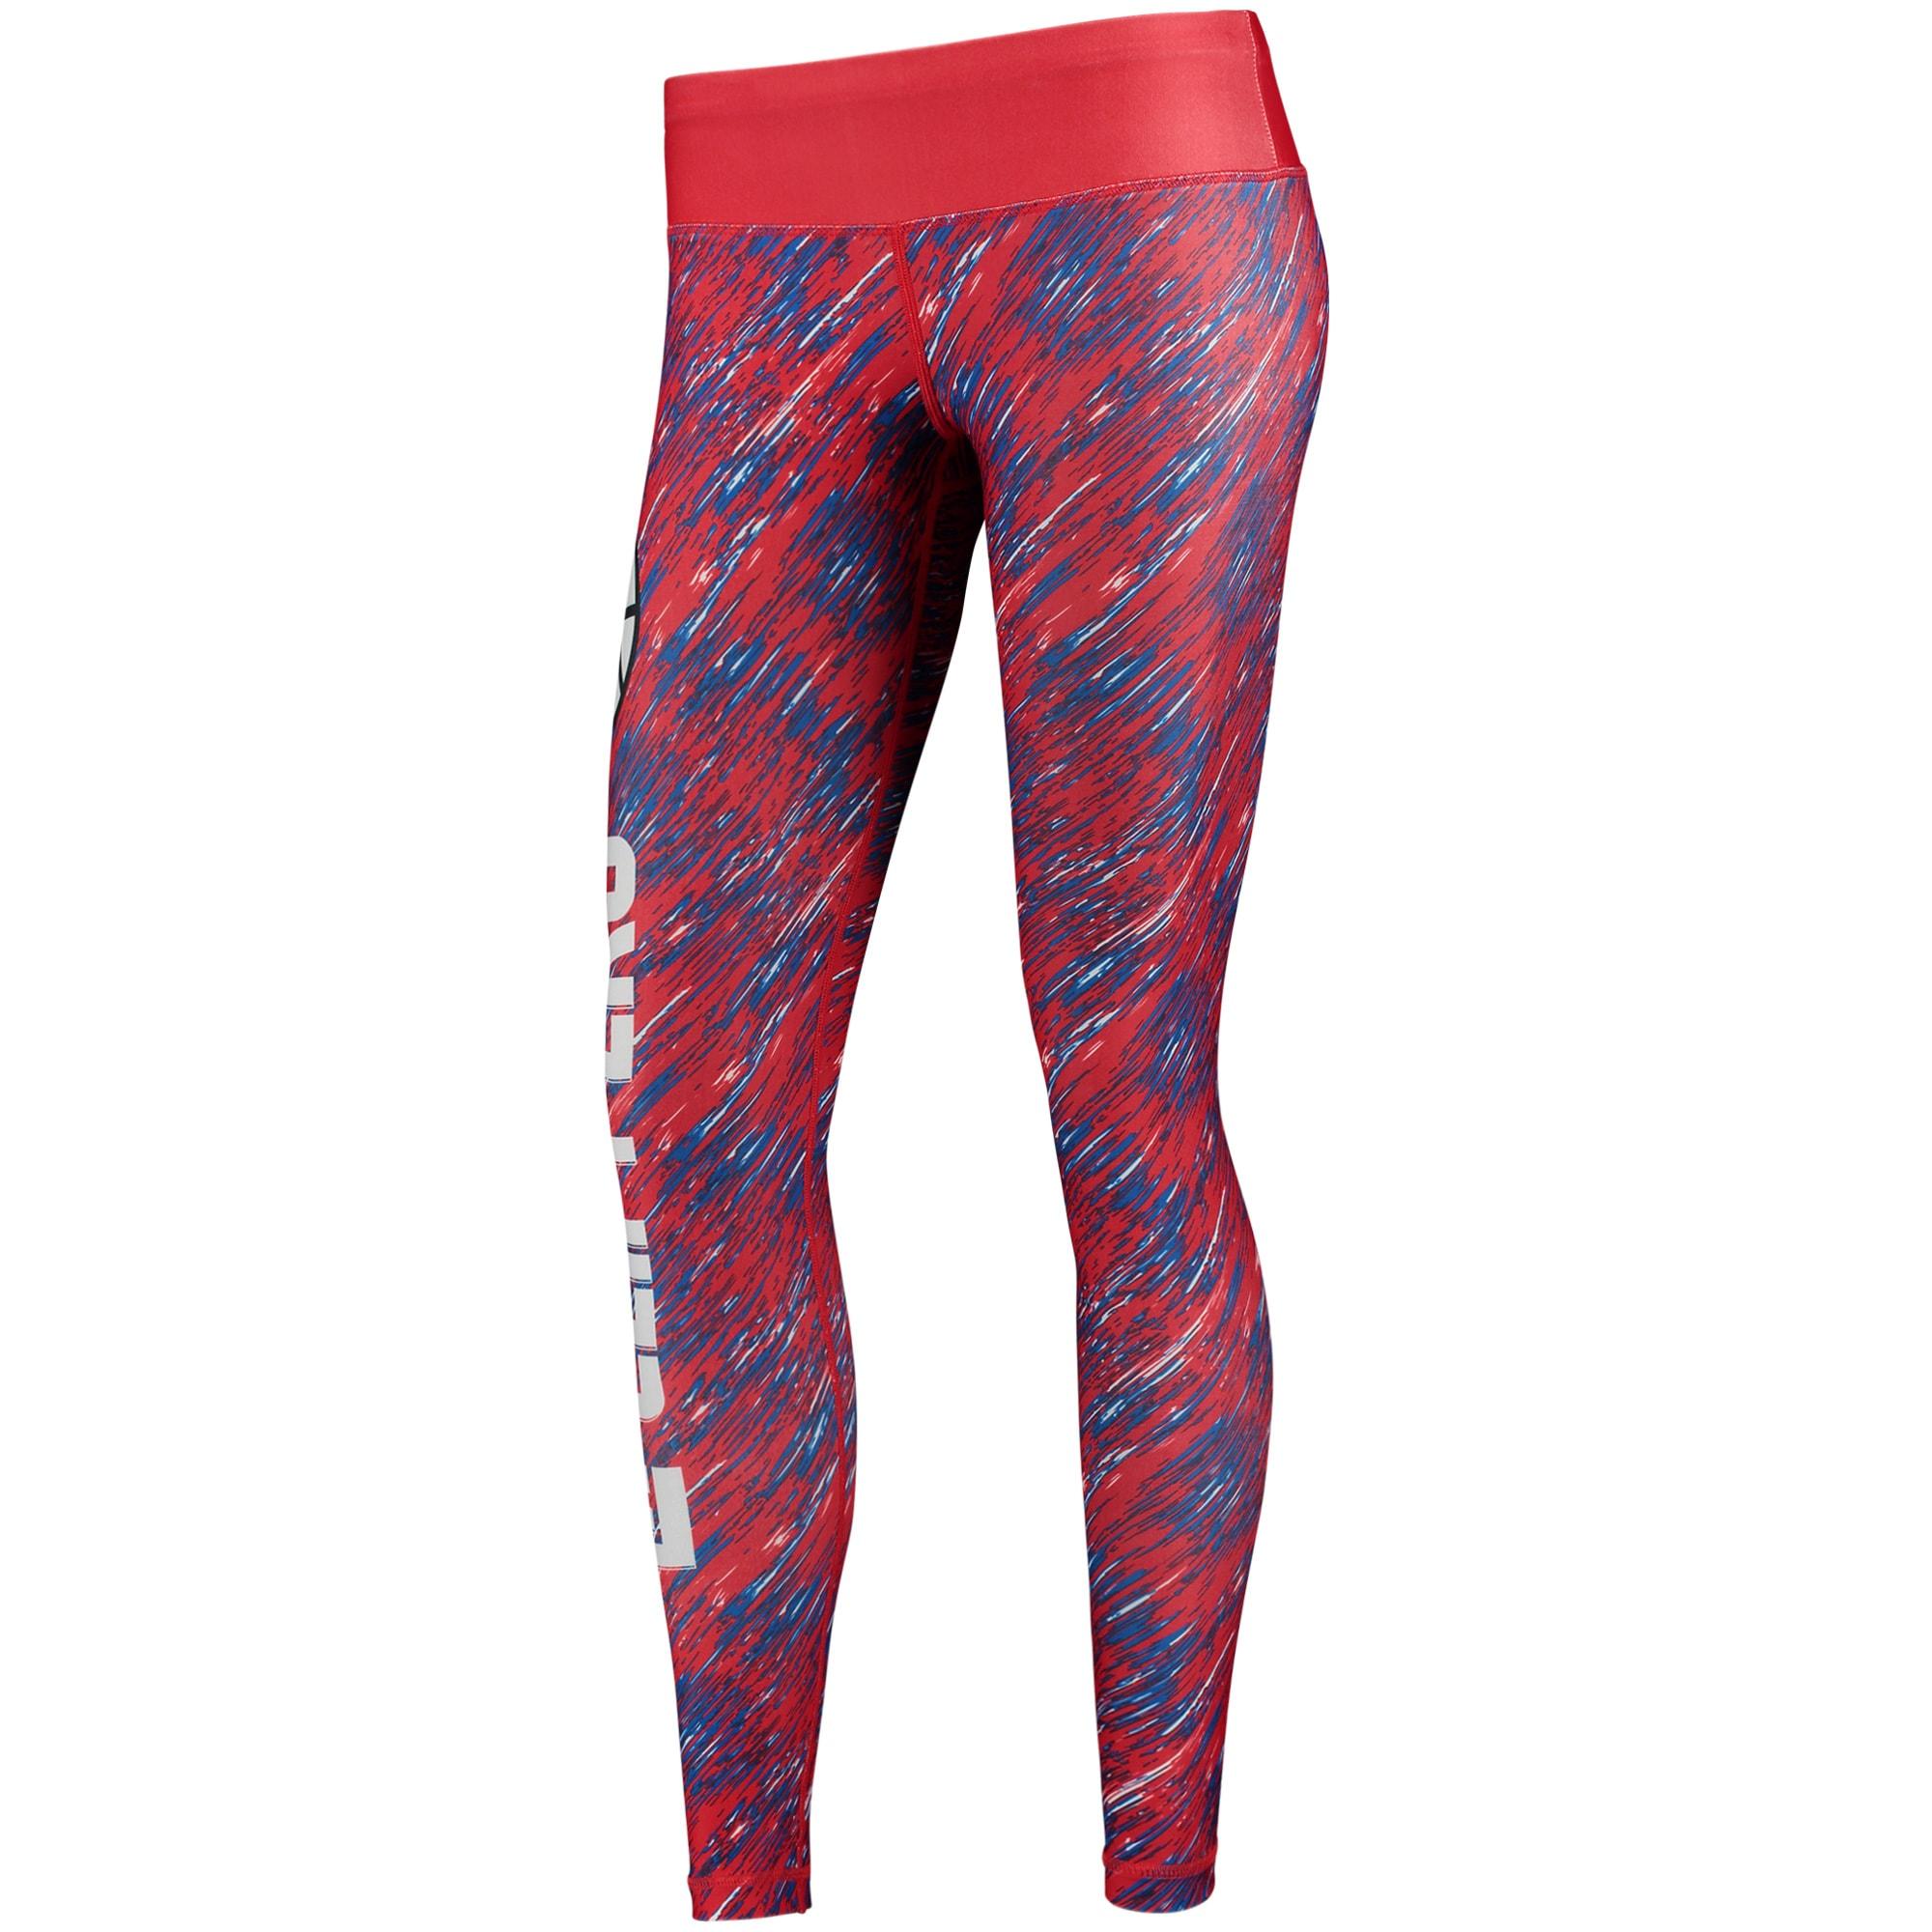 LA Clippers Women's Static Rain Leggings - Red